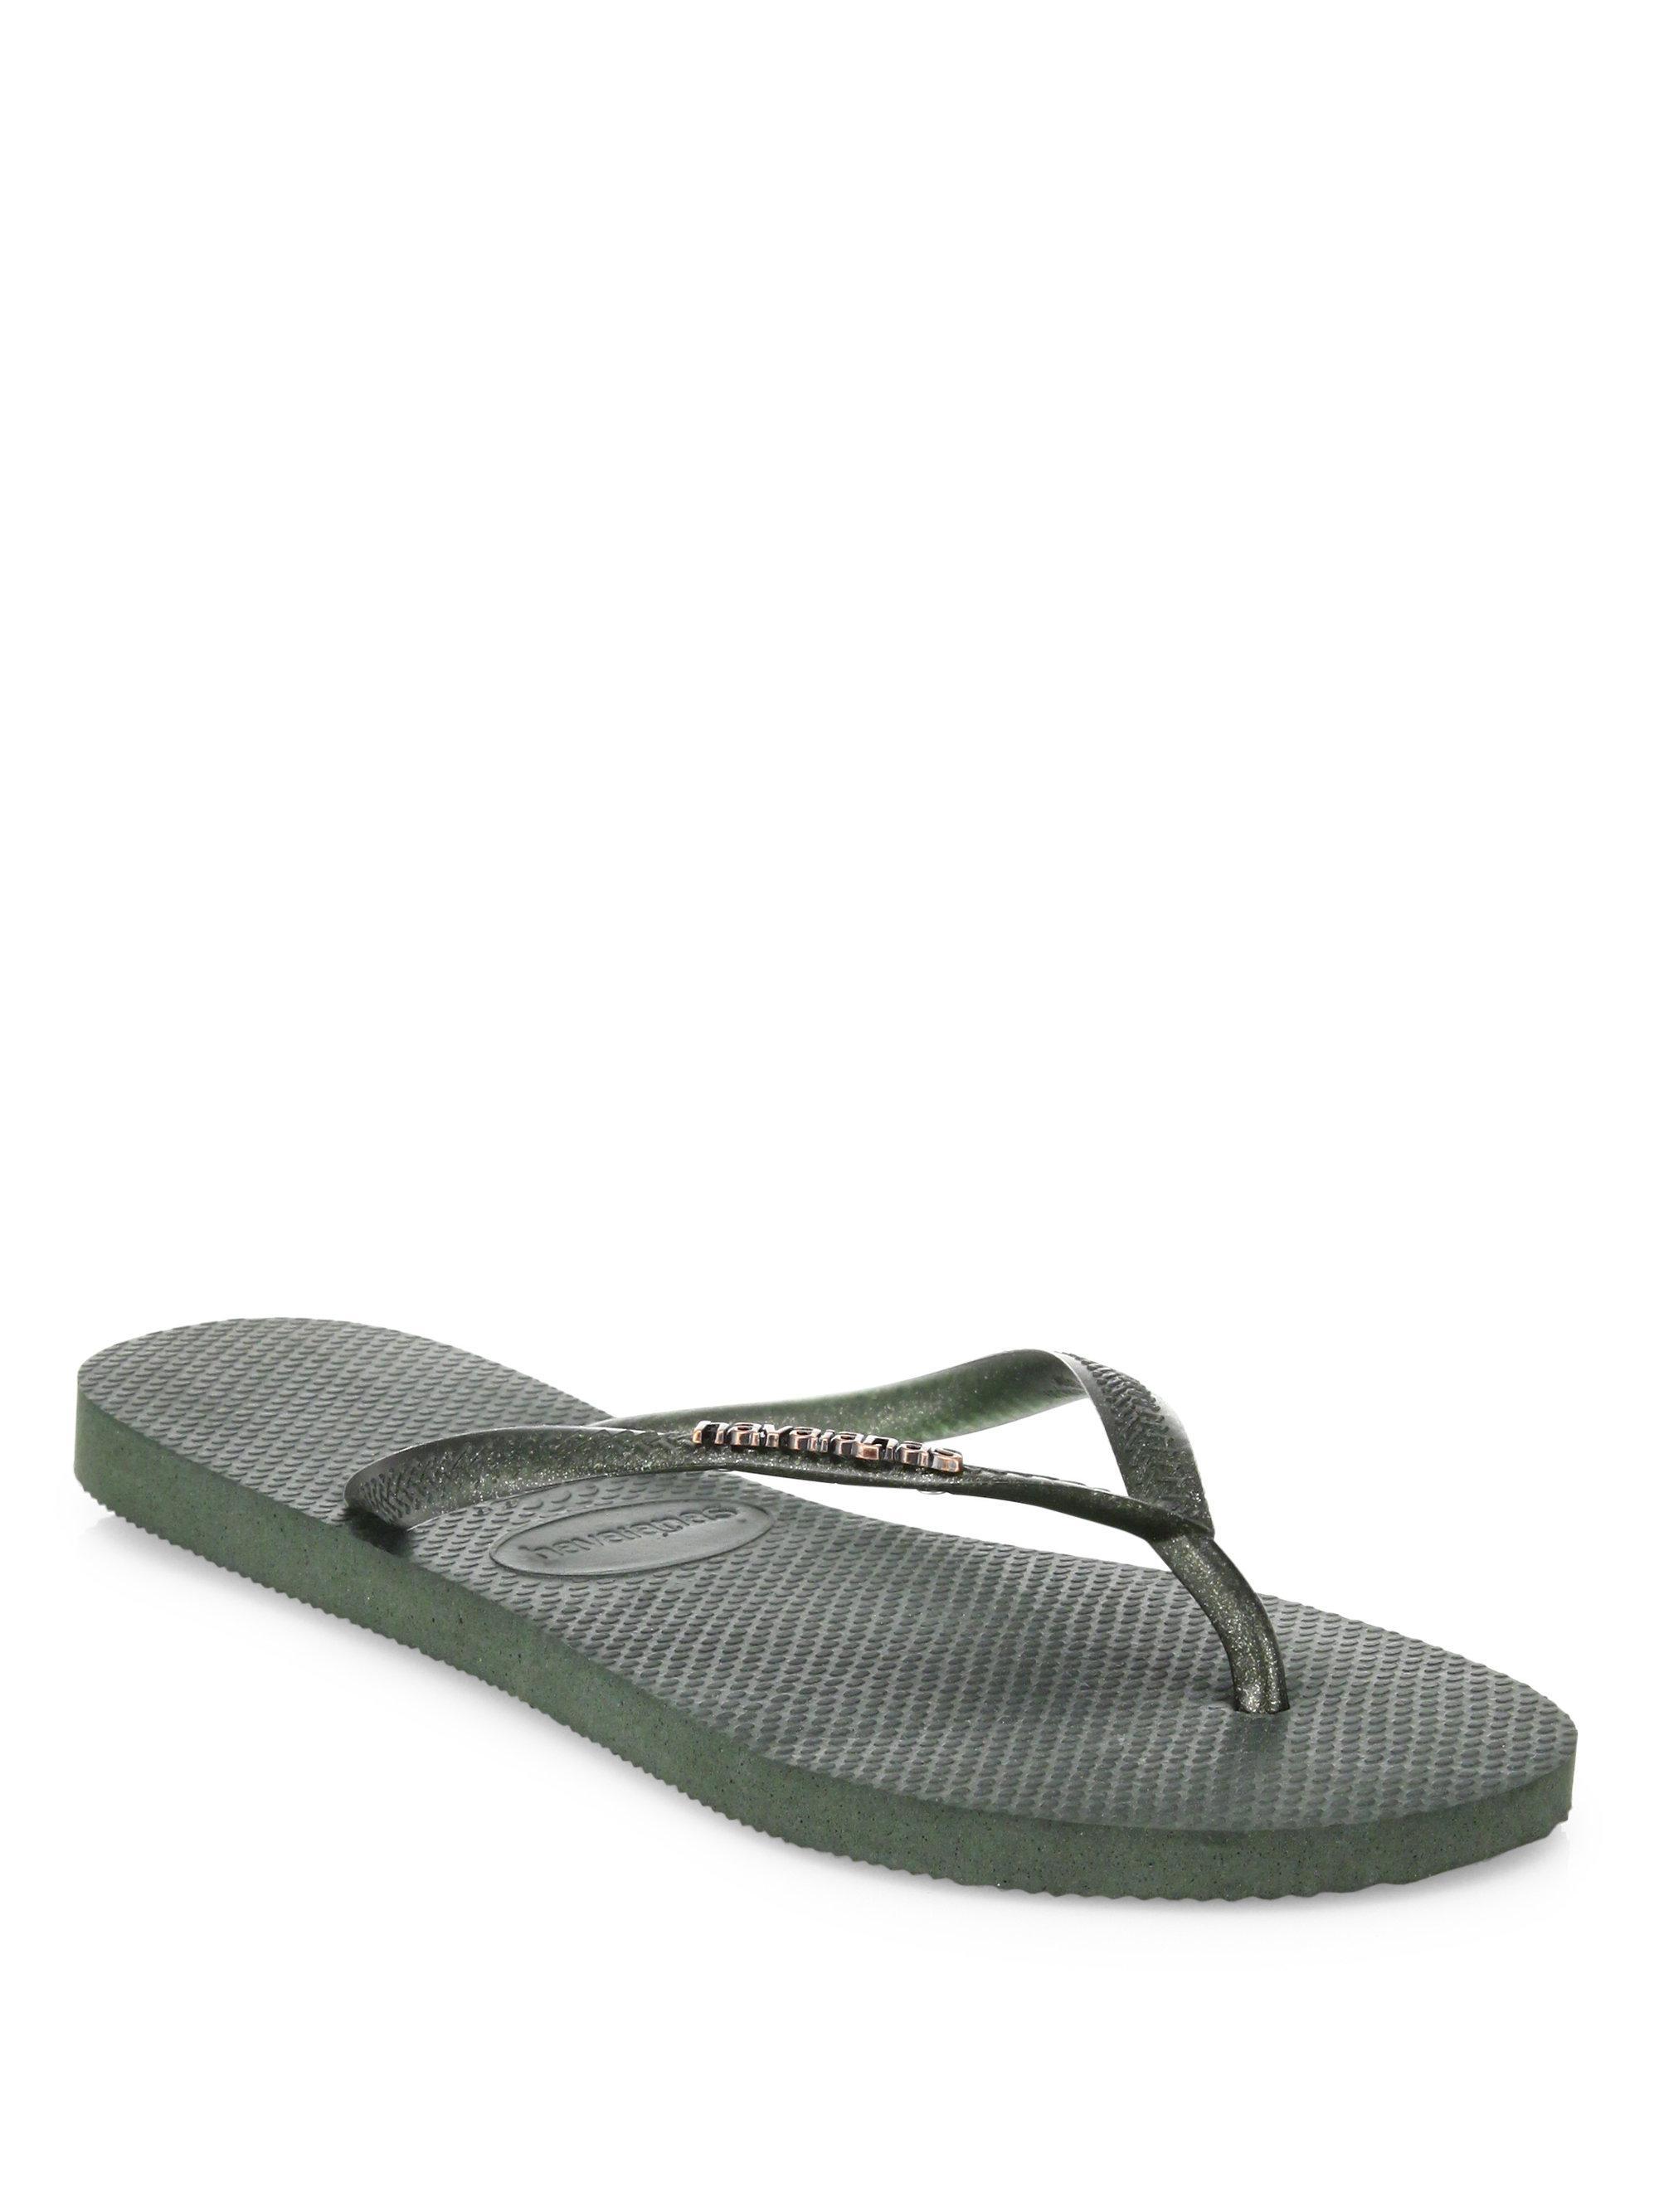 87aebe7ee Lyst - Havaianas Slim Logo Metallic Glitter Flip Flops in Green